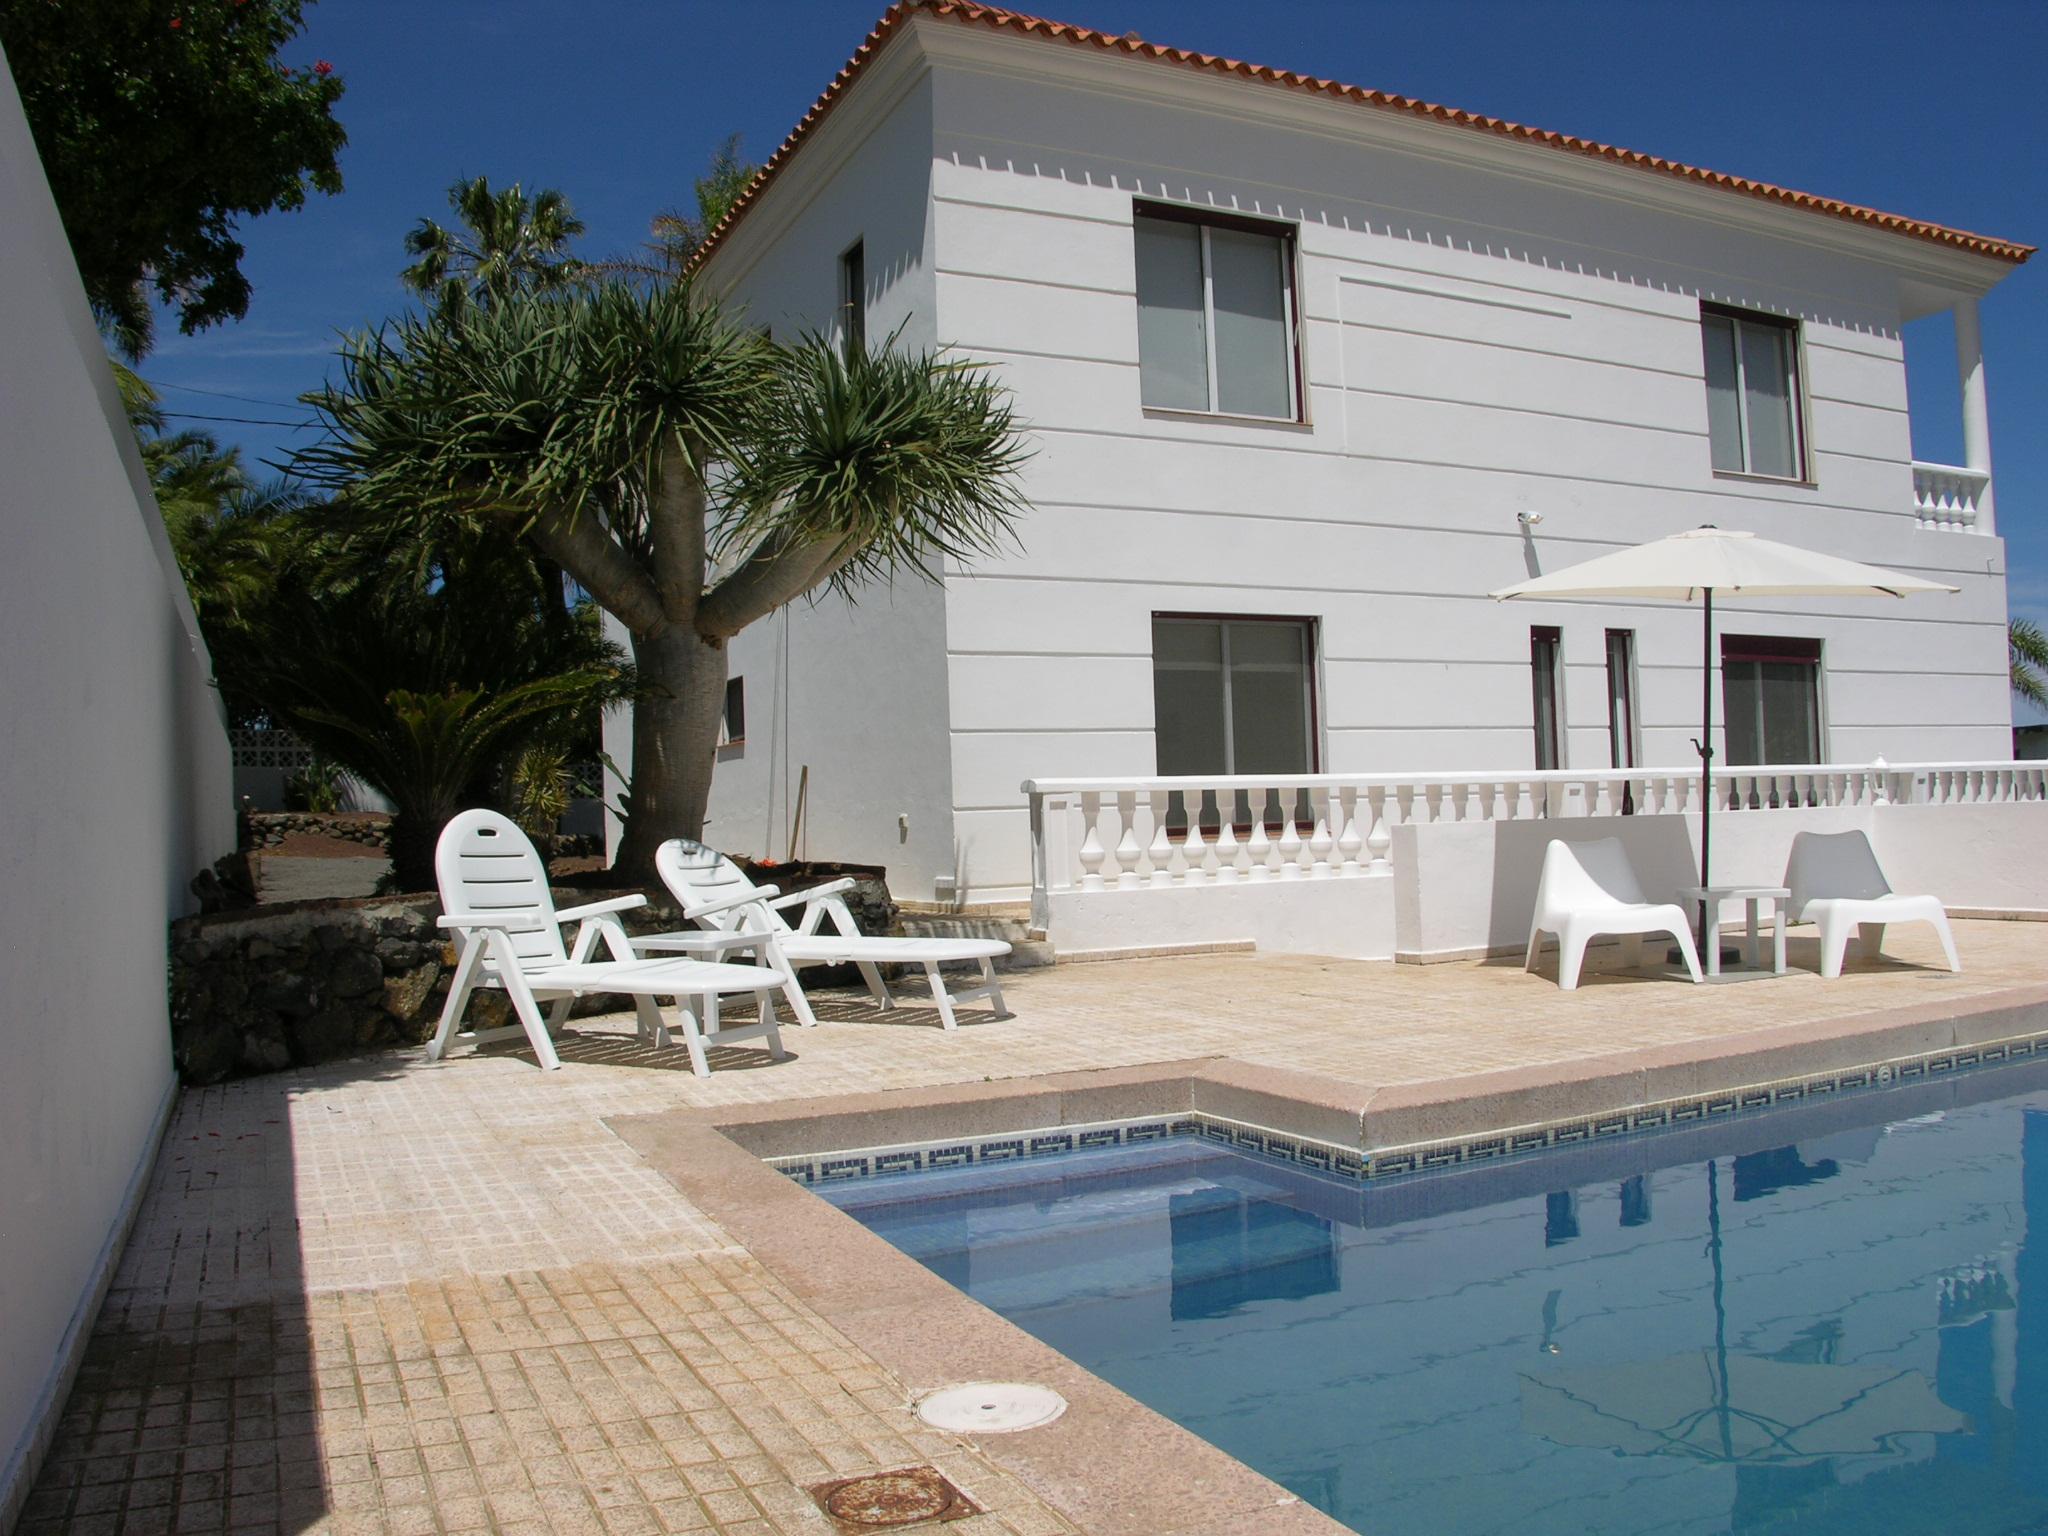 Maison de vacances Villa Vista La Quinta beheizbarer Pool kostenloses WLAN Grill (2124407), Santa Ursula, Ténérife, Iles Canaries, Espagne, image 48